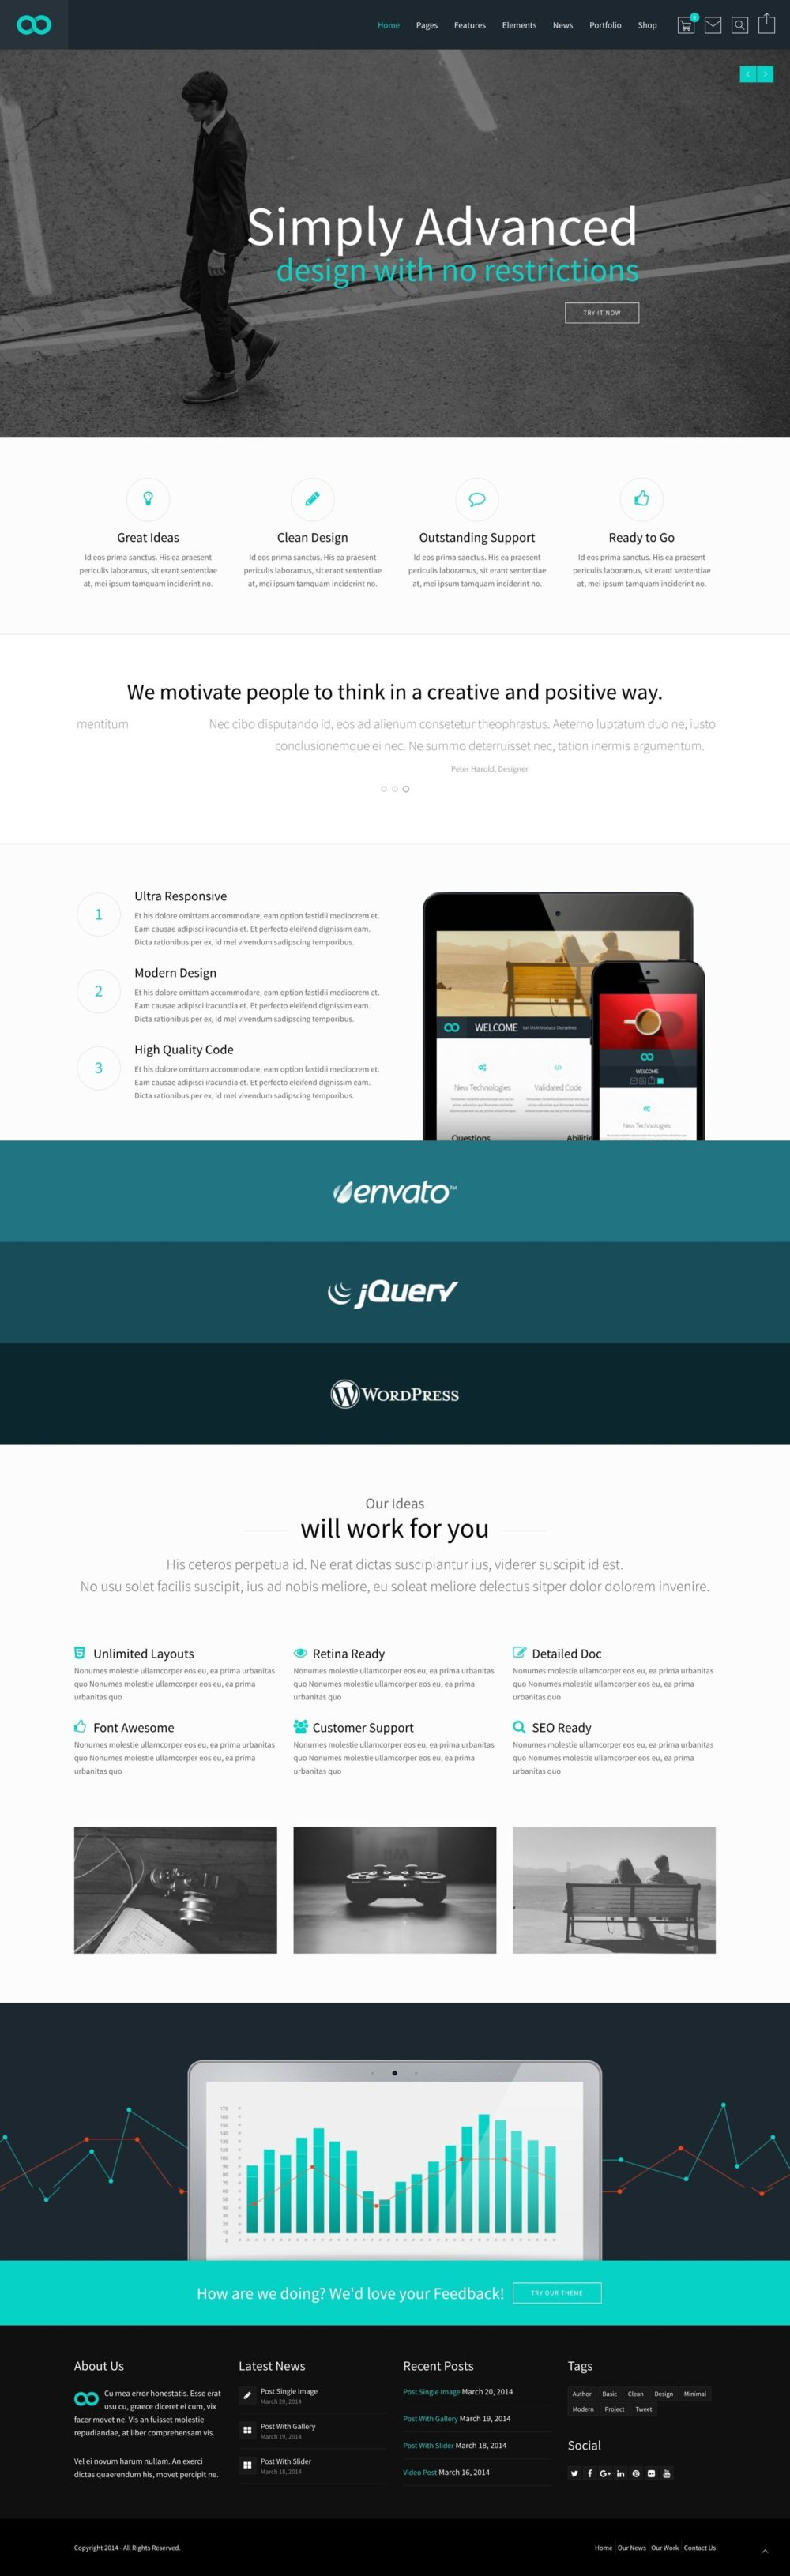 Greatives Premium WordPress themes, Reload theme